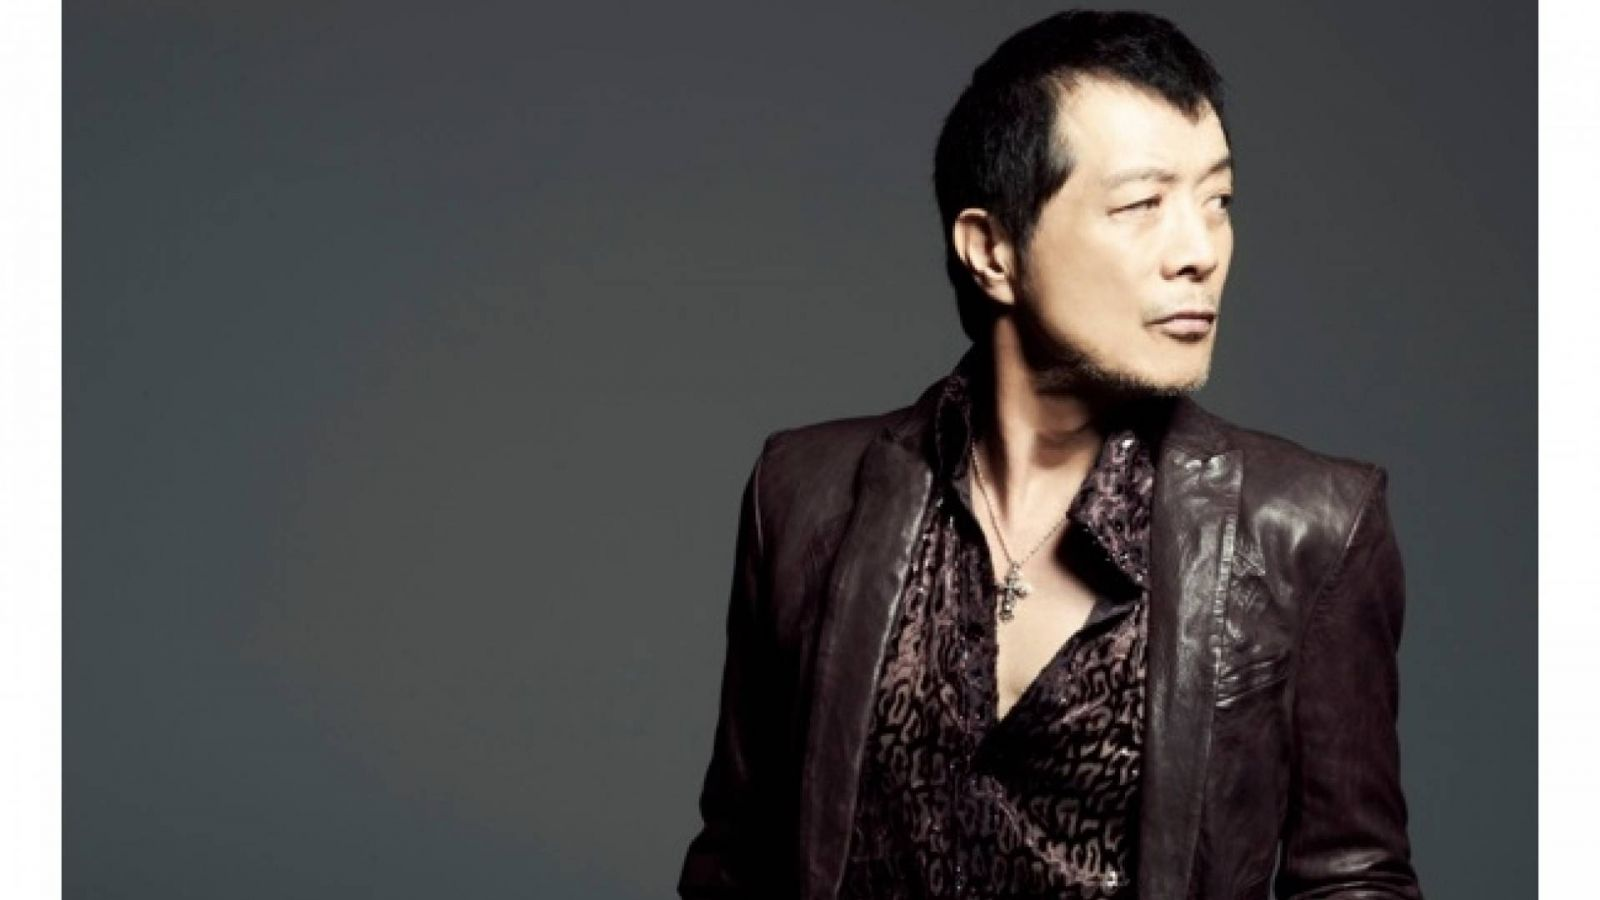 Yazawa Eikichi © Eikichi Yazawa / GARURU RECORDS. All Rights Reserved.